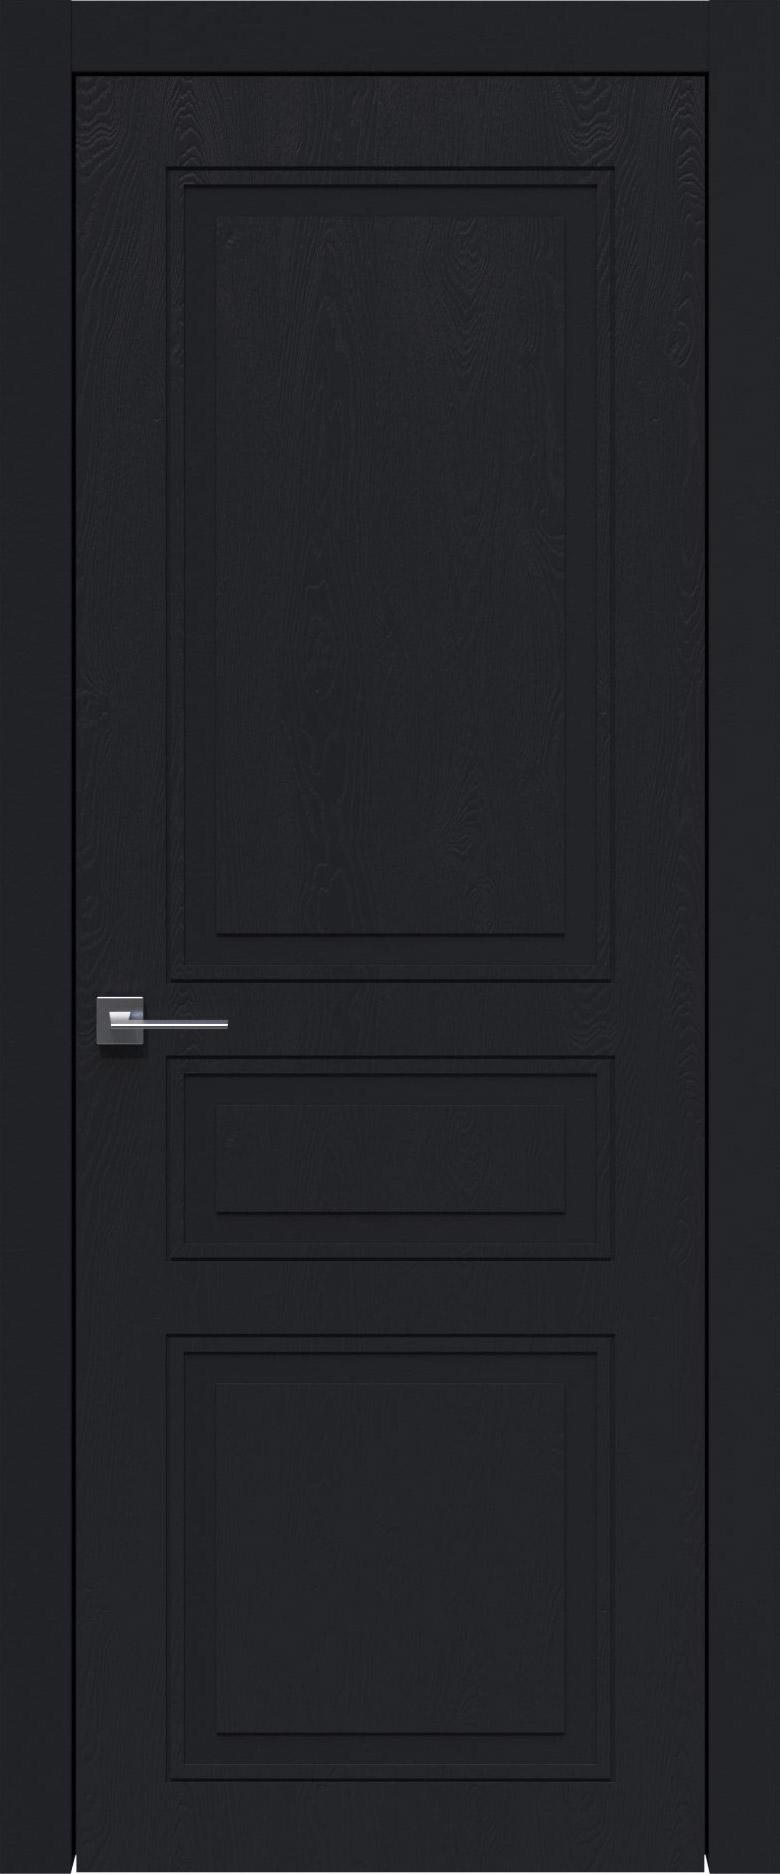 Imperia-R Neo Classic цвет - Черная эмаль по шпону (RAL 9004) Без стекла (ДГ)